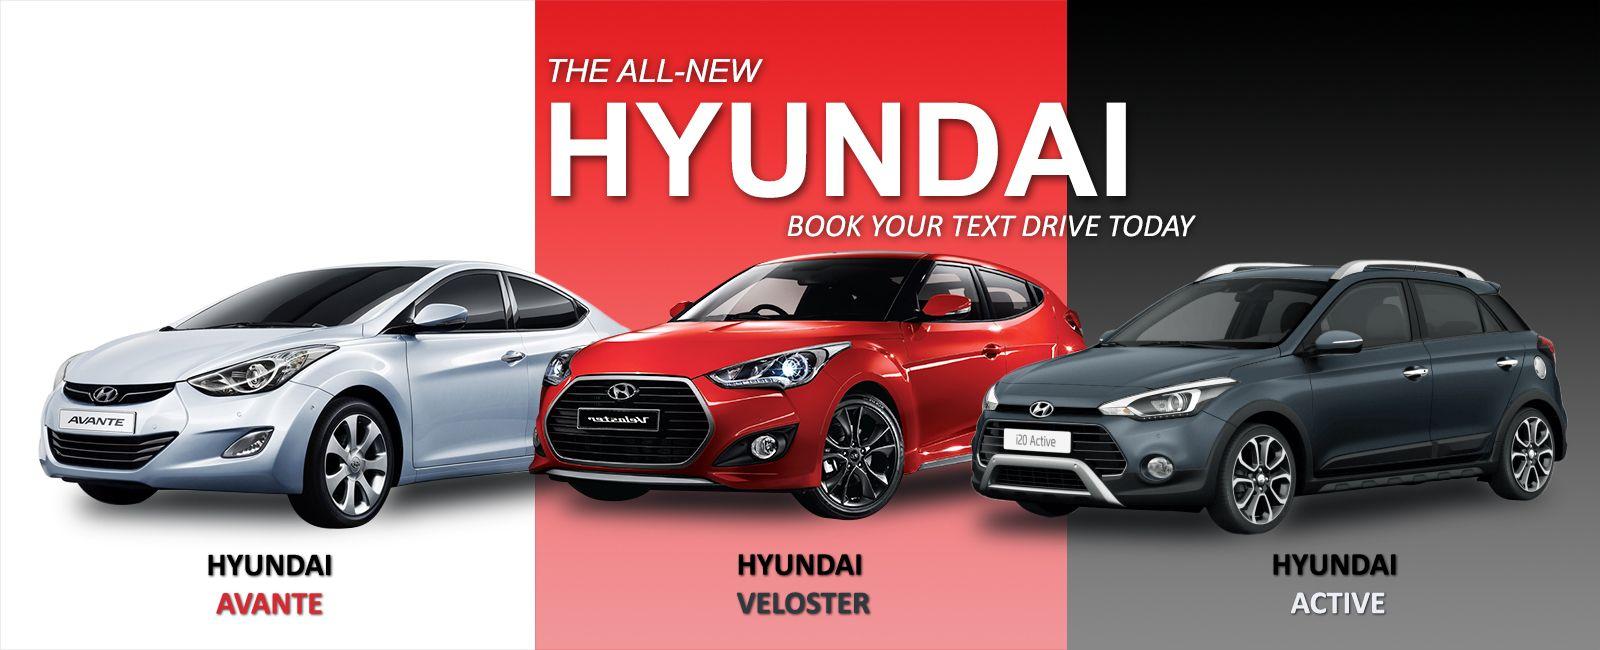 Pin By Ehsan Ahmad On Graphic Design New Hyundai Toy Car Hyundai